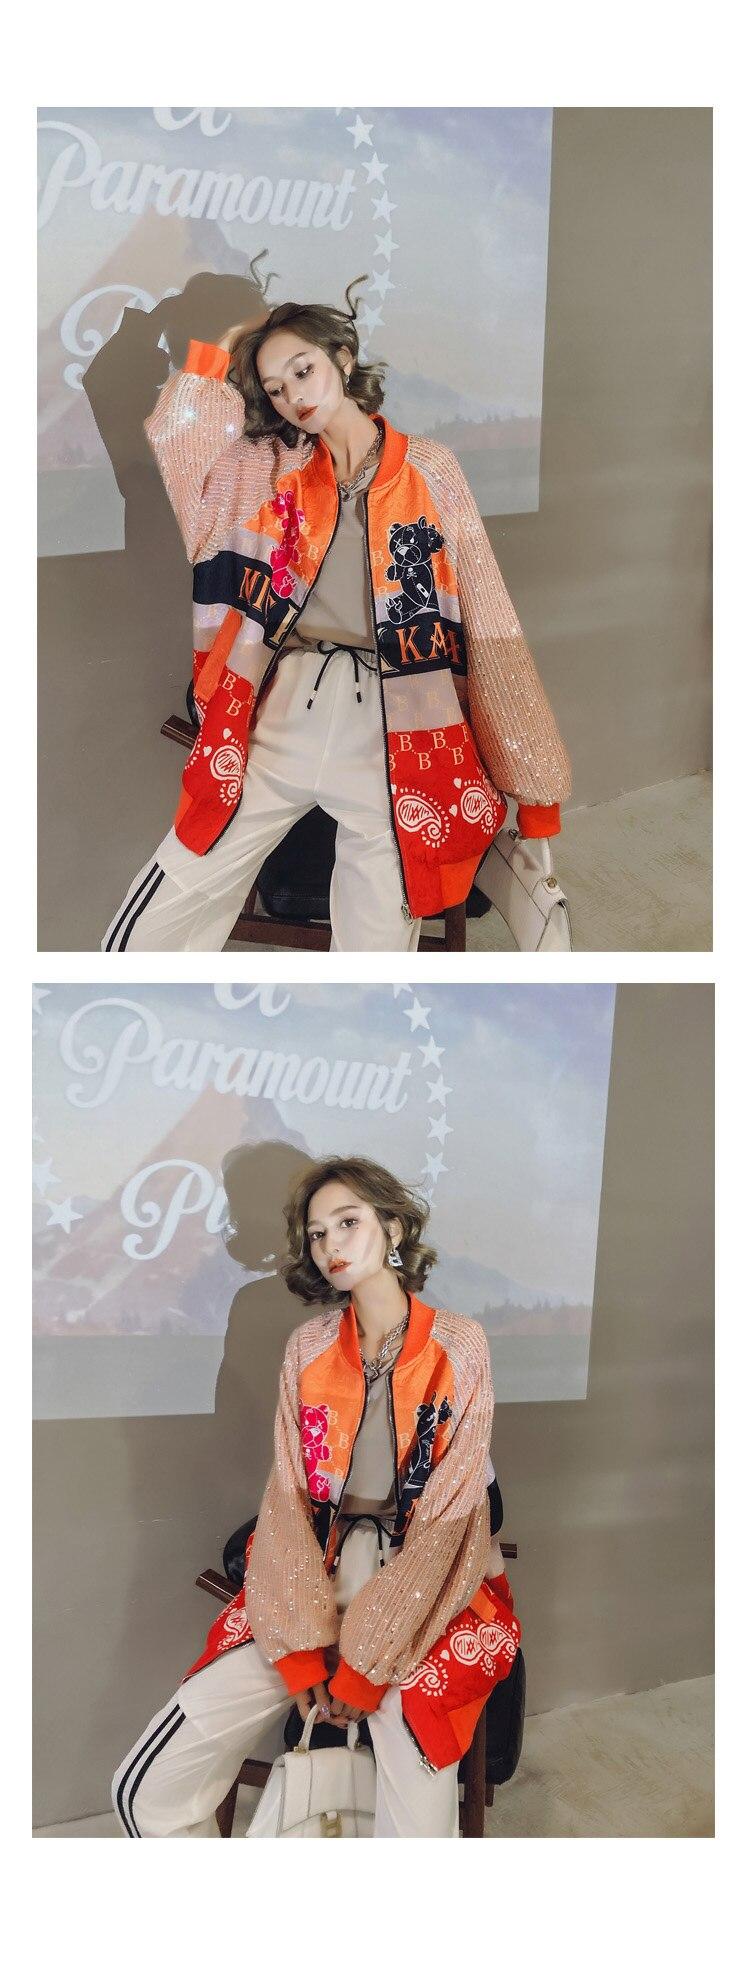 Hf0f3f0e37eb044d6820c78f182a8d1bfP 2021 Spring Women Long Sequins Print Patchwork Loose Coat